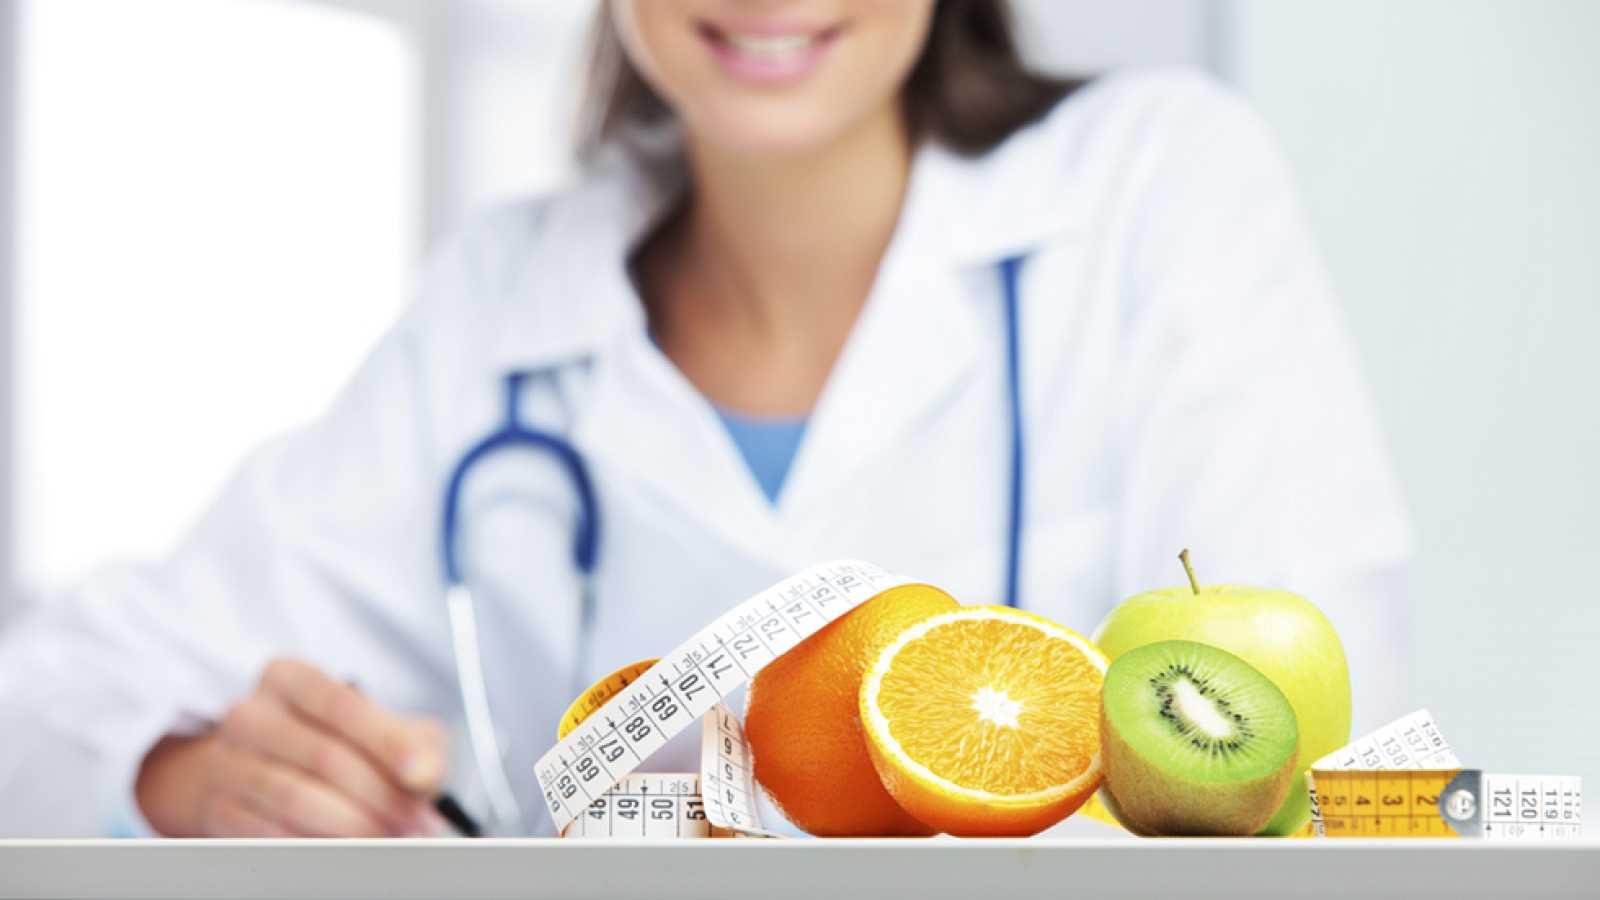 Saber Vivir Dietas Para Adelgazar ~ Dieta Adelgazamiento Saber Vivir